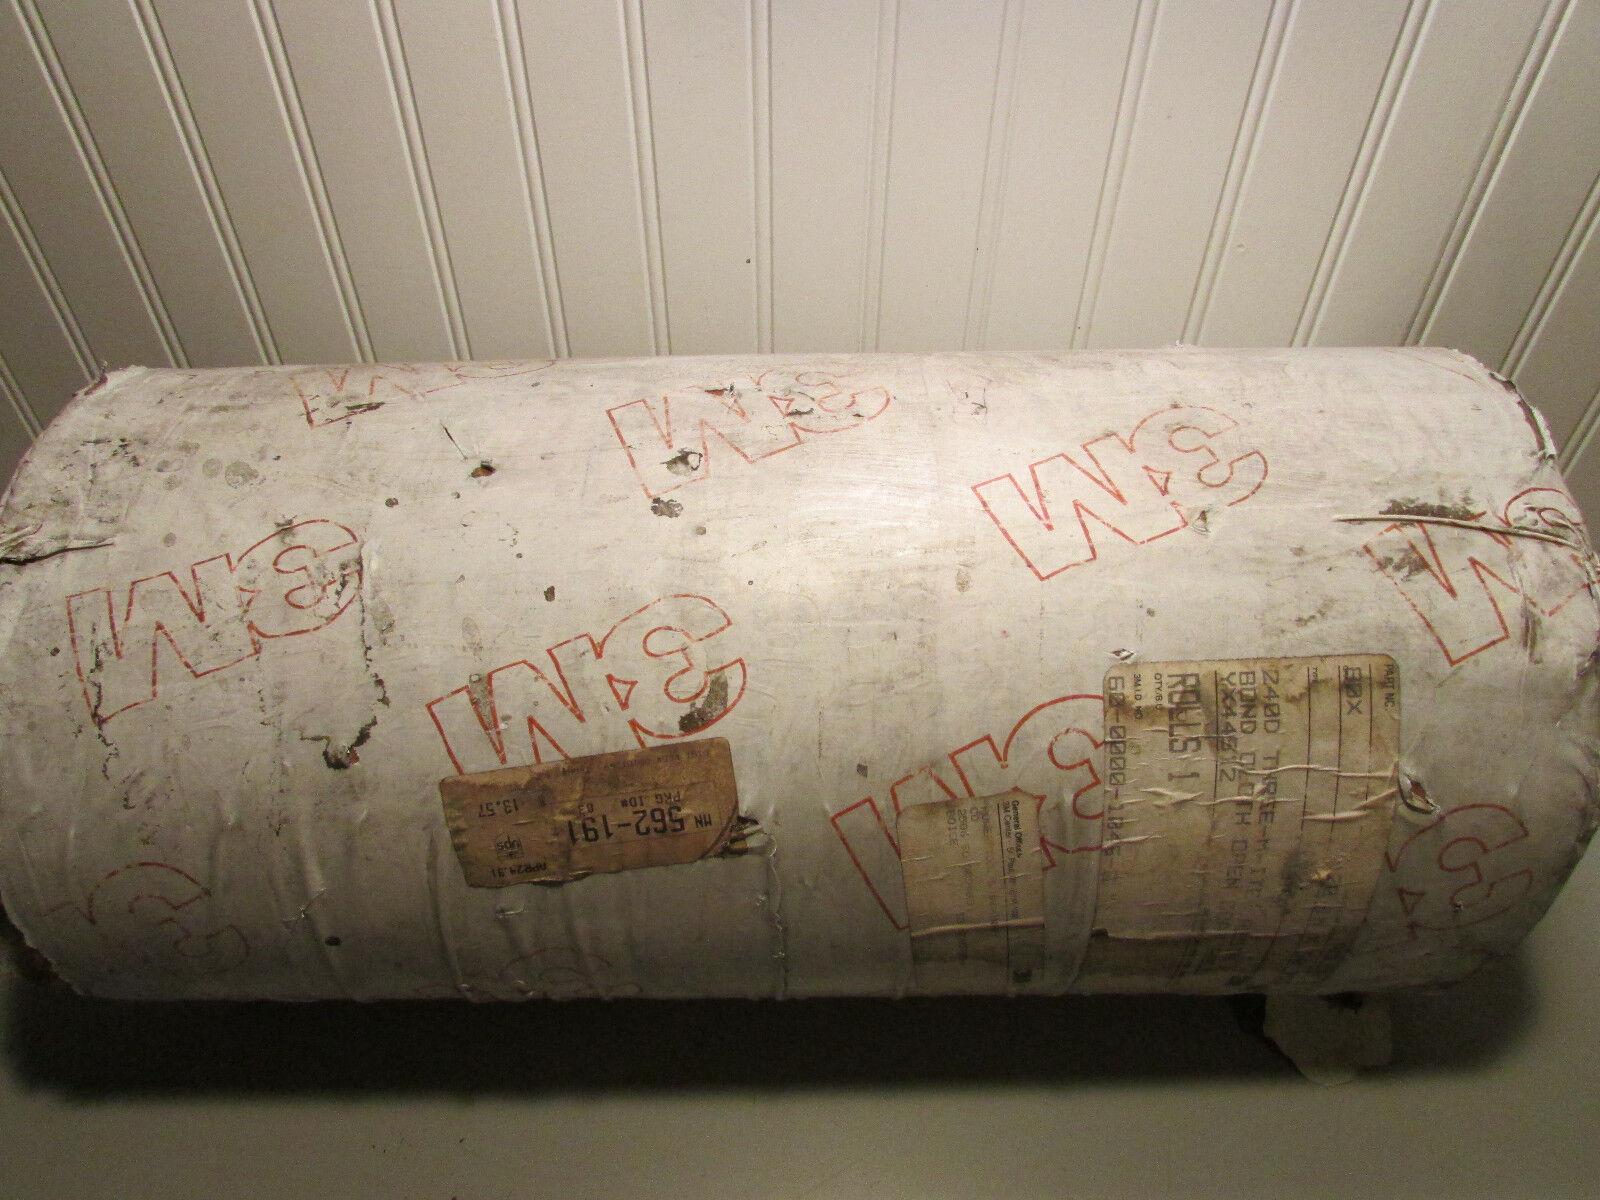 3M Sandpaper 24OD Three-M-ITE Resin Bond Cloth Open Coat Roll 20'' x 50 Yds 80X